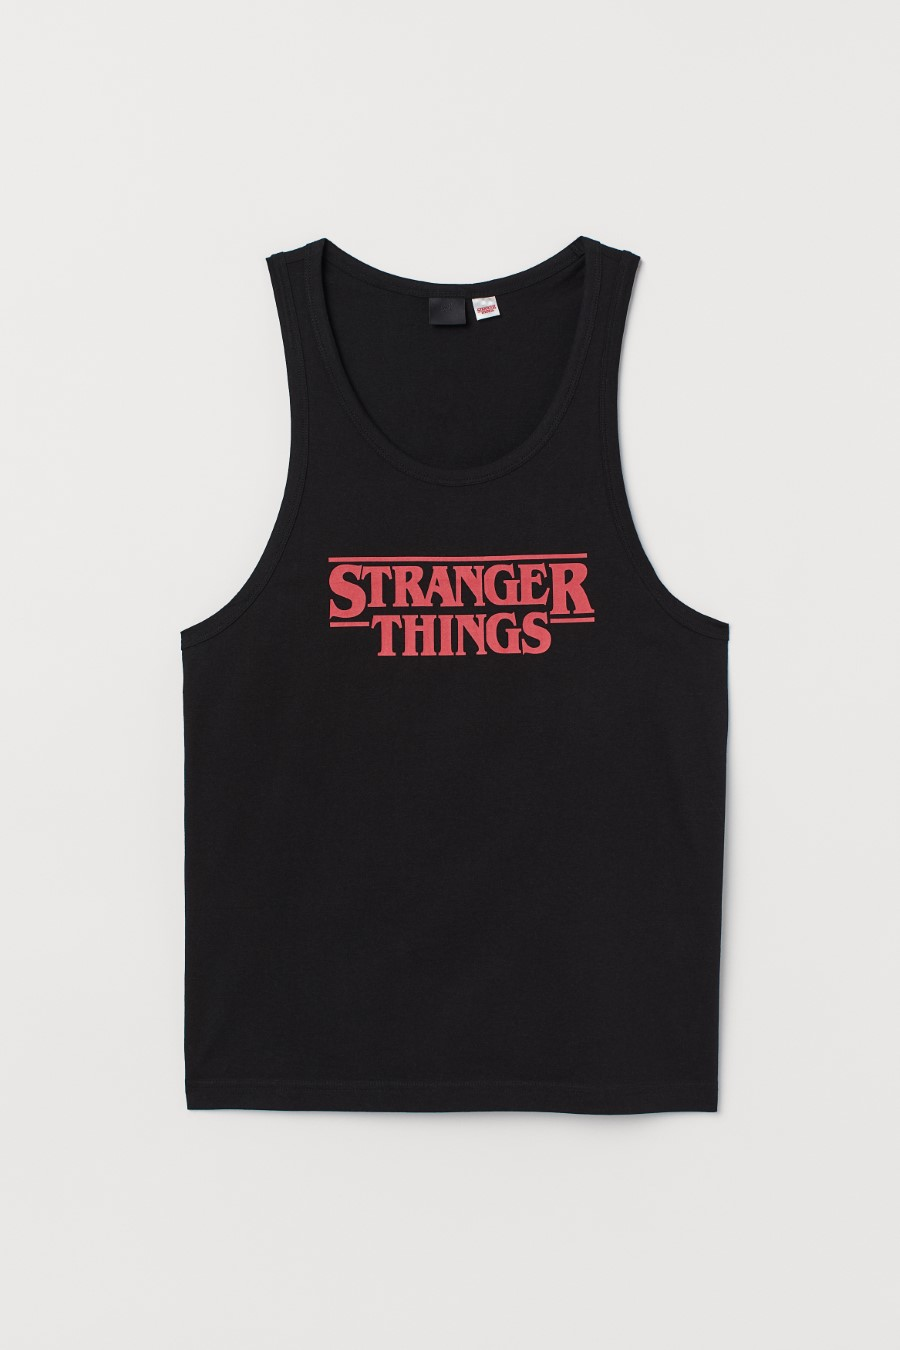 H&M x Netflix - Stranger Things